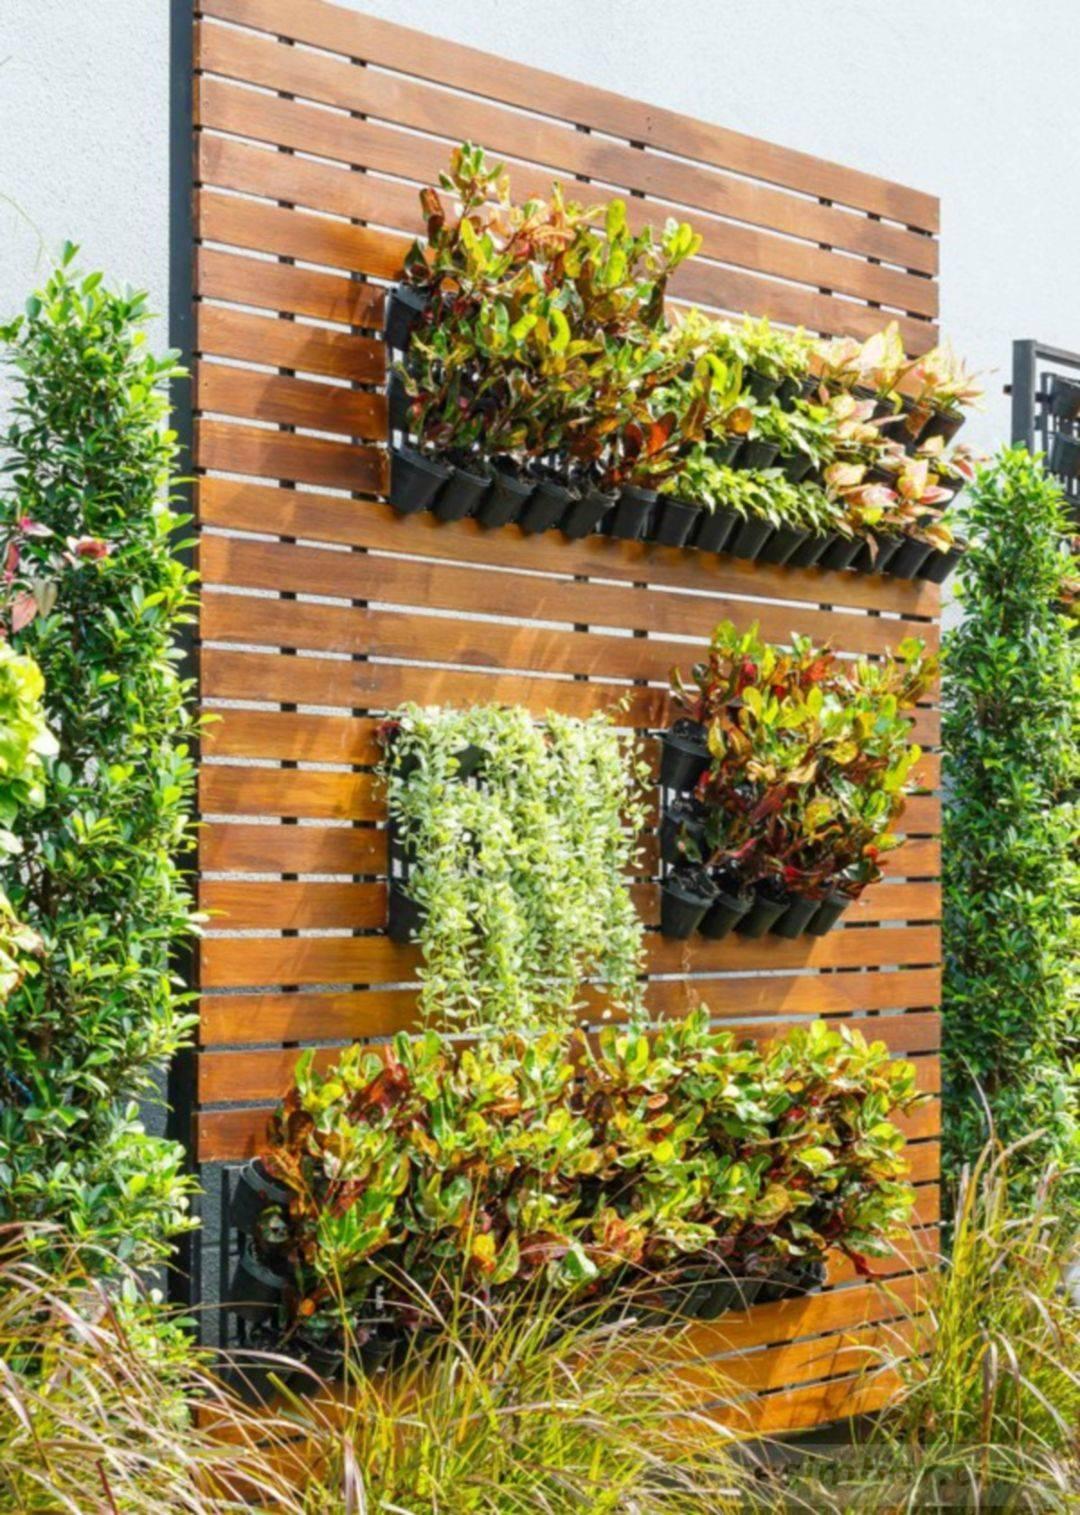 amazing garden ideas-478859372874597928